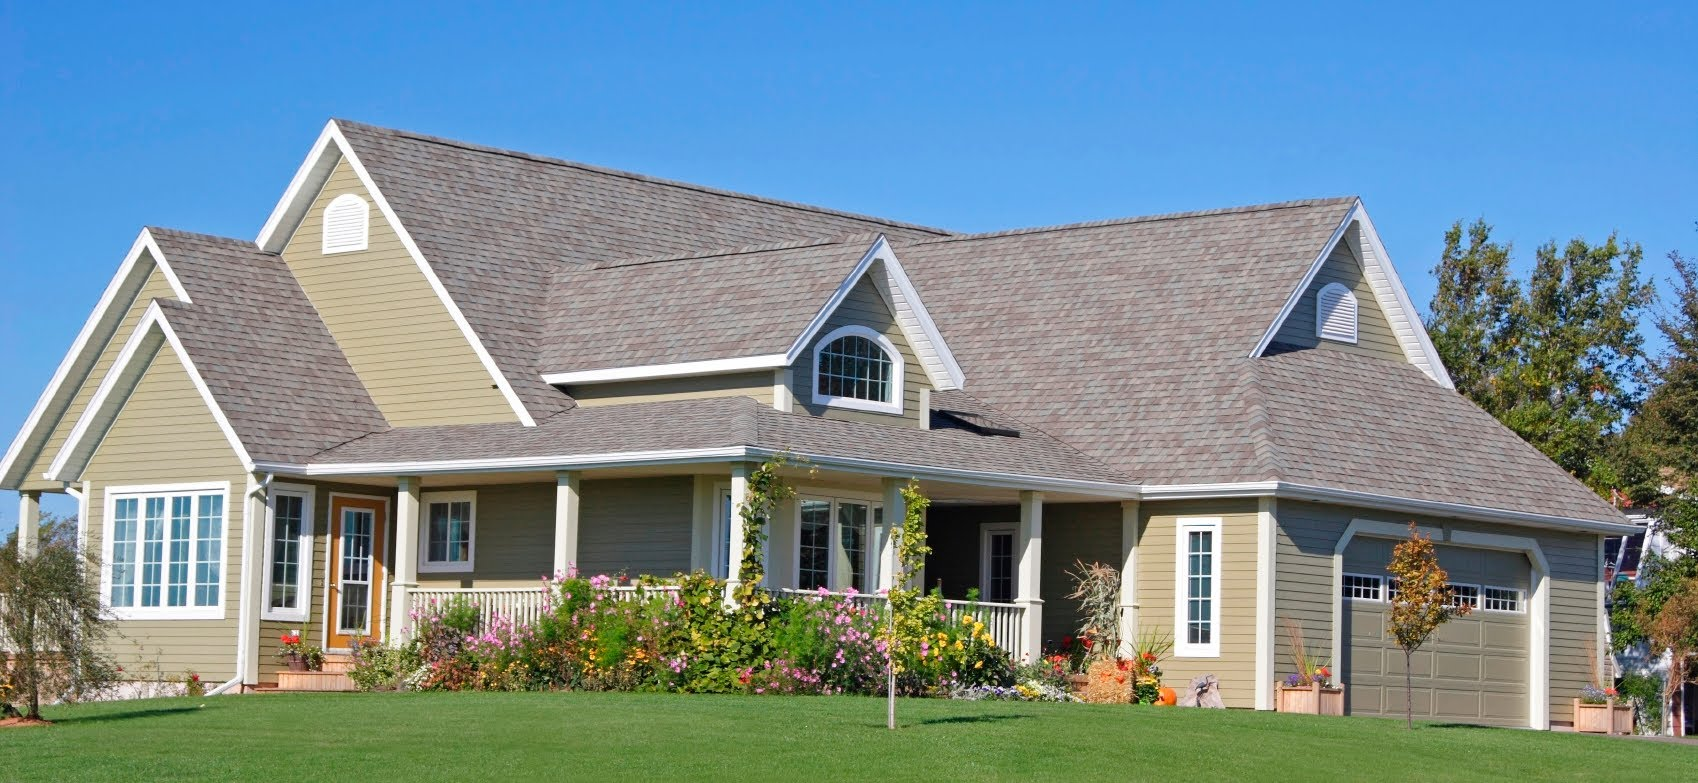 Price Of Prefab Homes modular homes prices. modular homes reviews modular shed modern